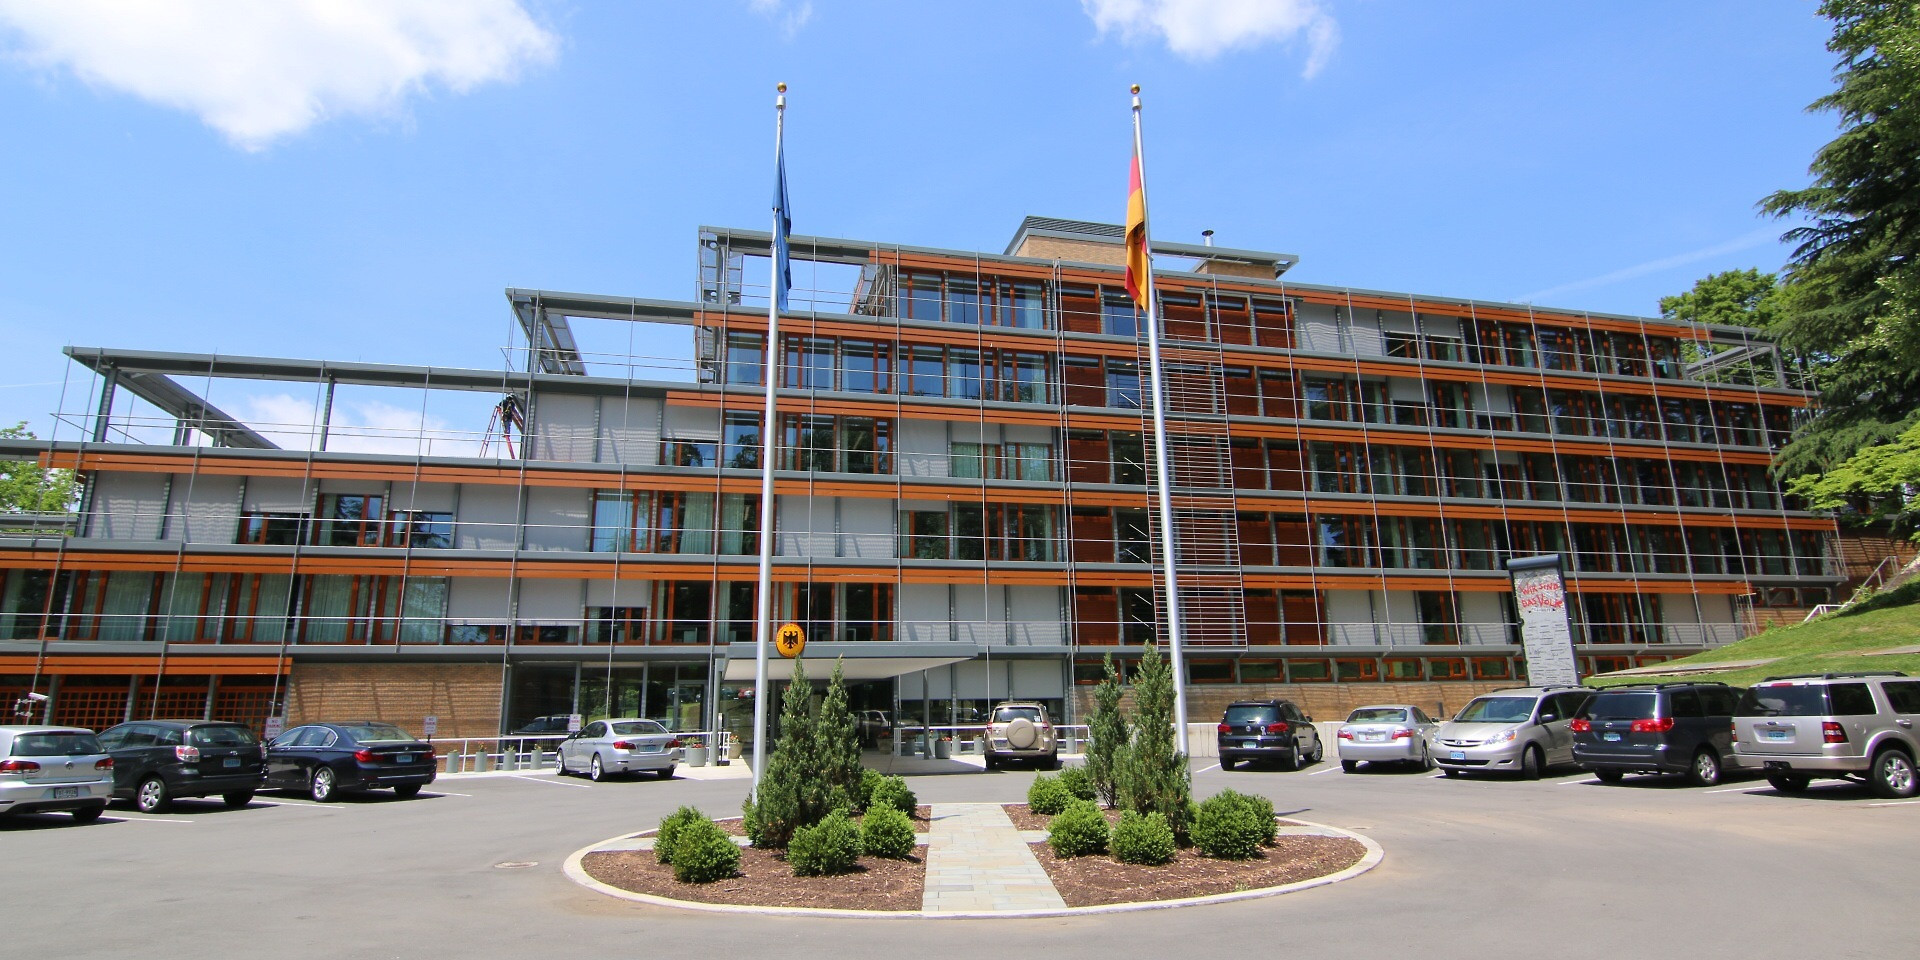 Embassy of Germany - Washington, D.C.